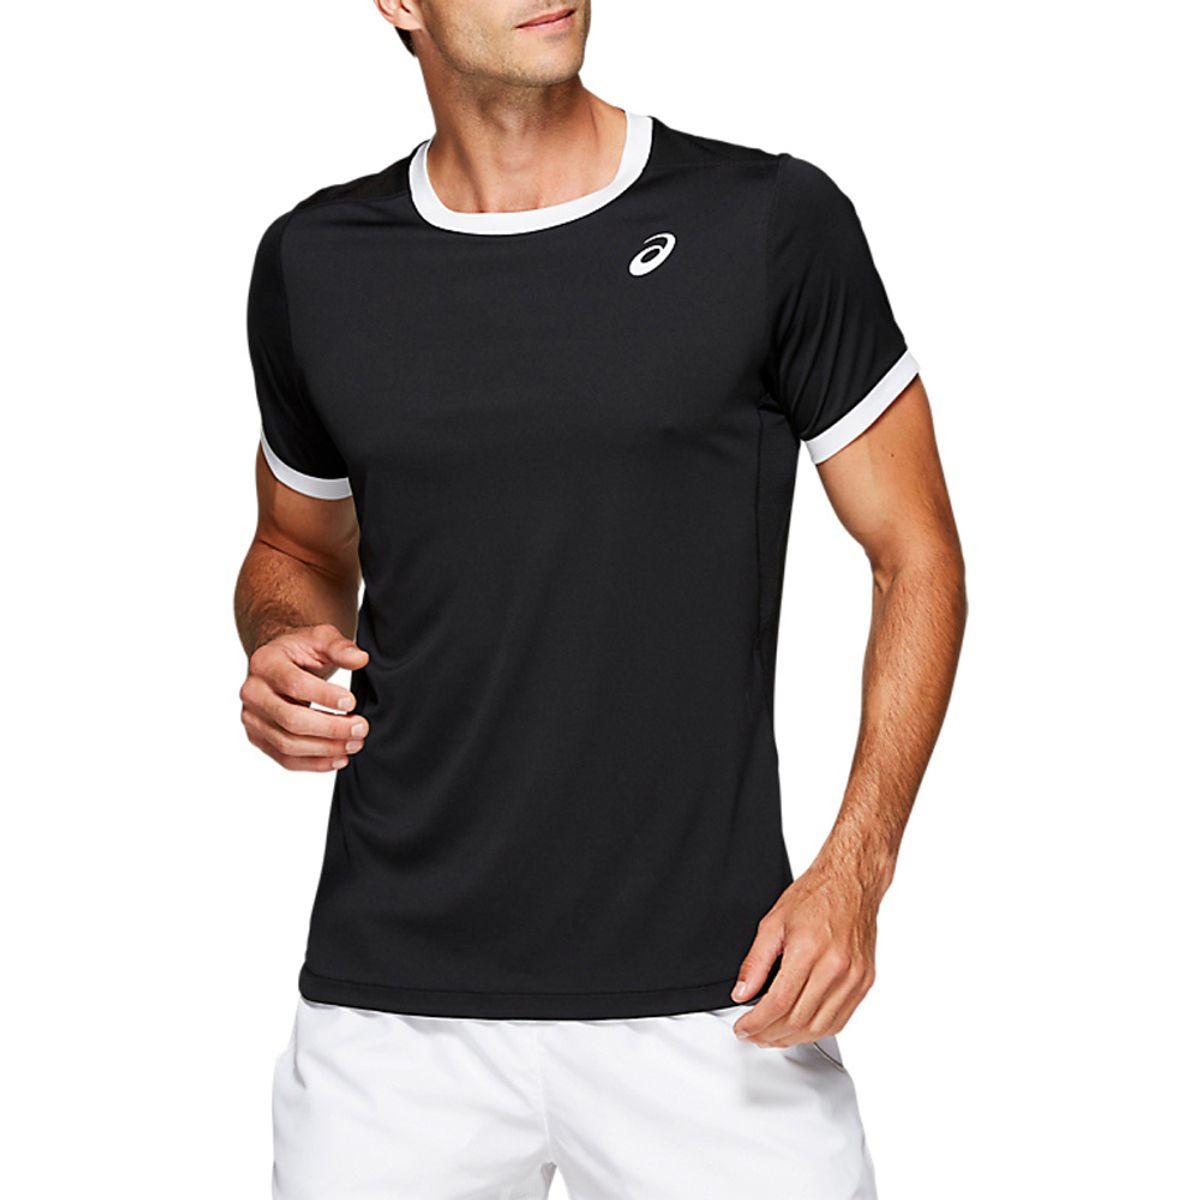 Camiseta-Asics-Short-Sleeve---Masculino---Preto